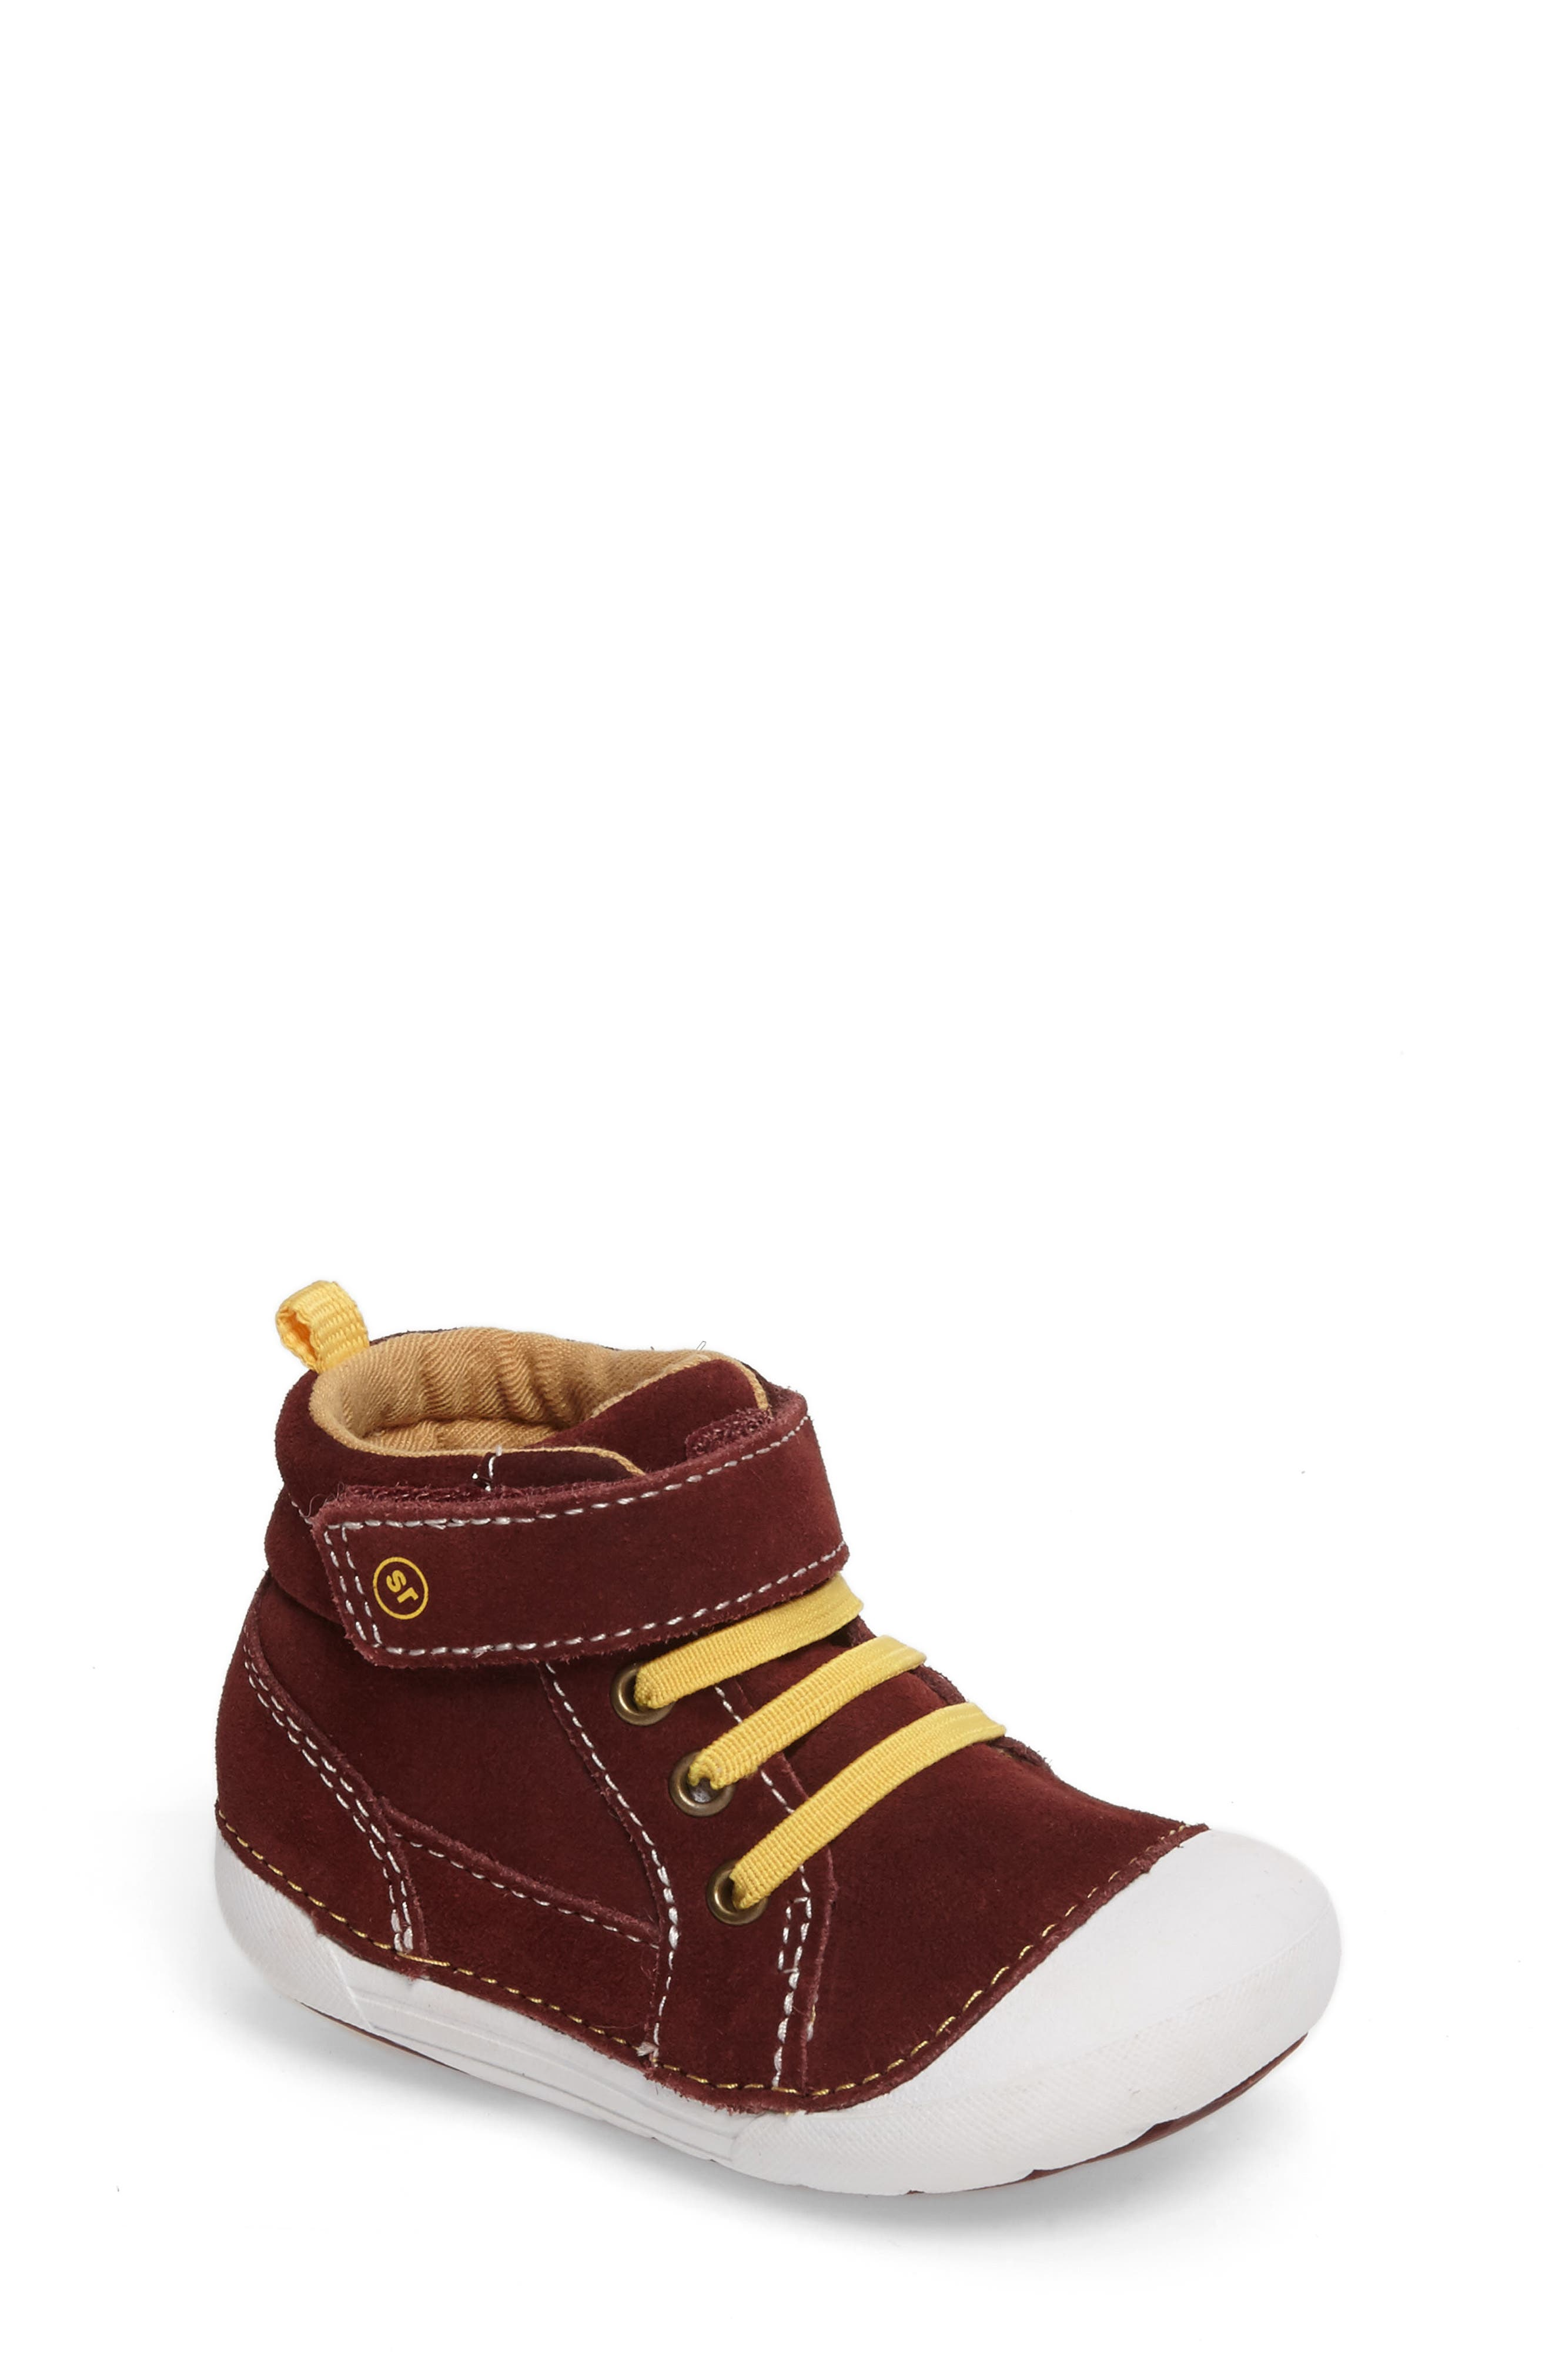 Alternate Image 1 Selected - Stride Rite Soft Motion Danny Sneaker (Baby & Walker)